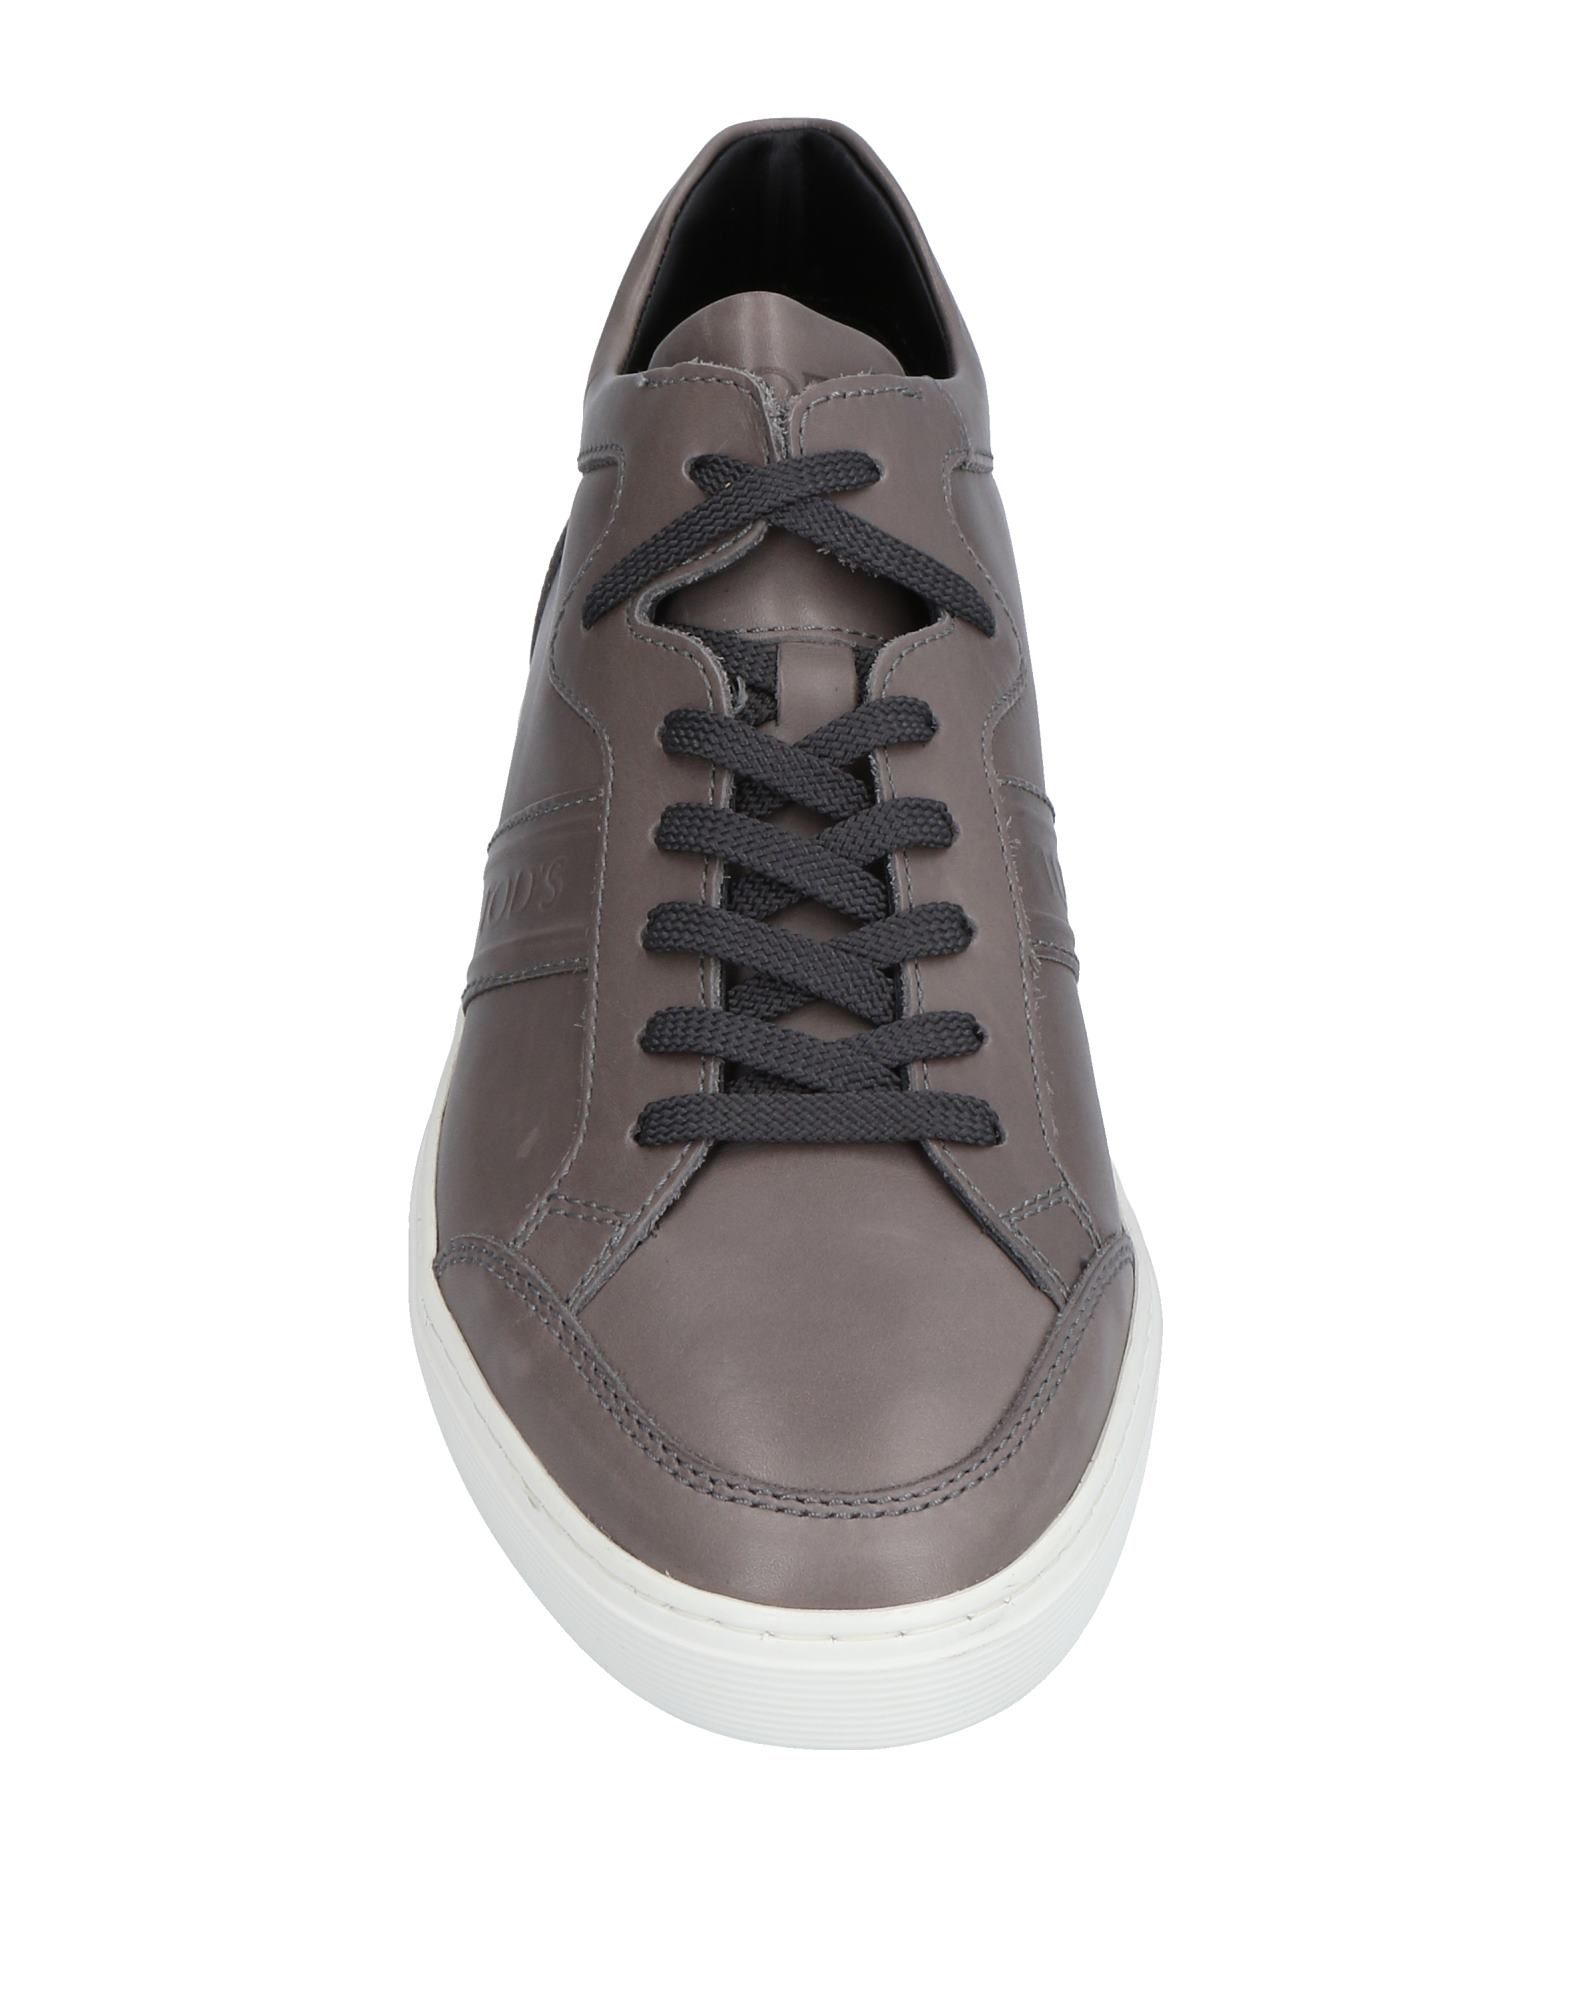 Tod's Sneakers Herren  11511813WN Heiße Heiße Heiße Schuhe 124478